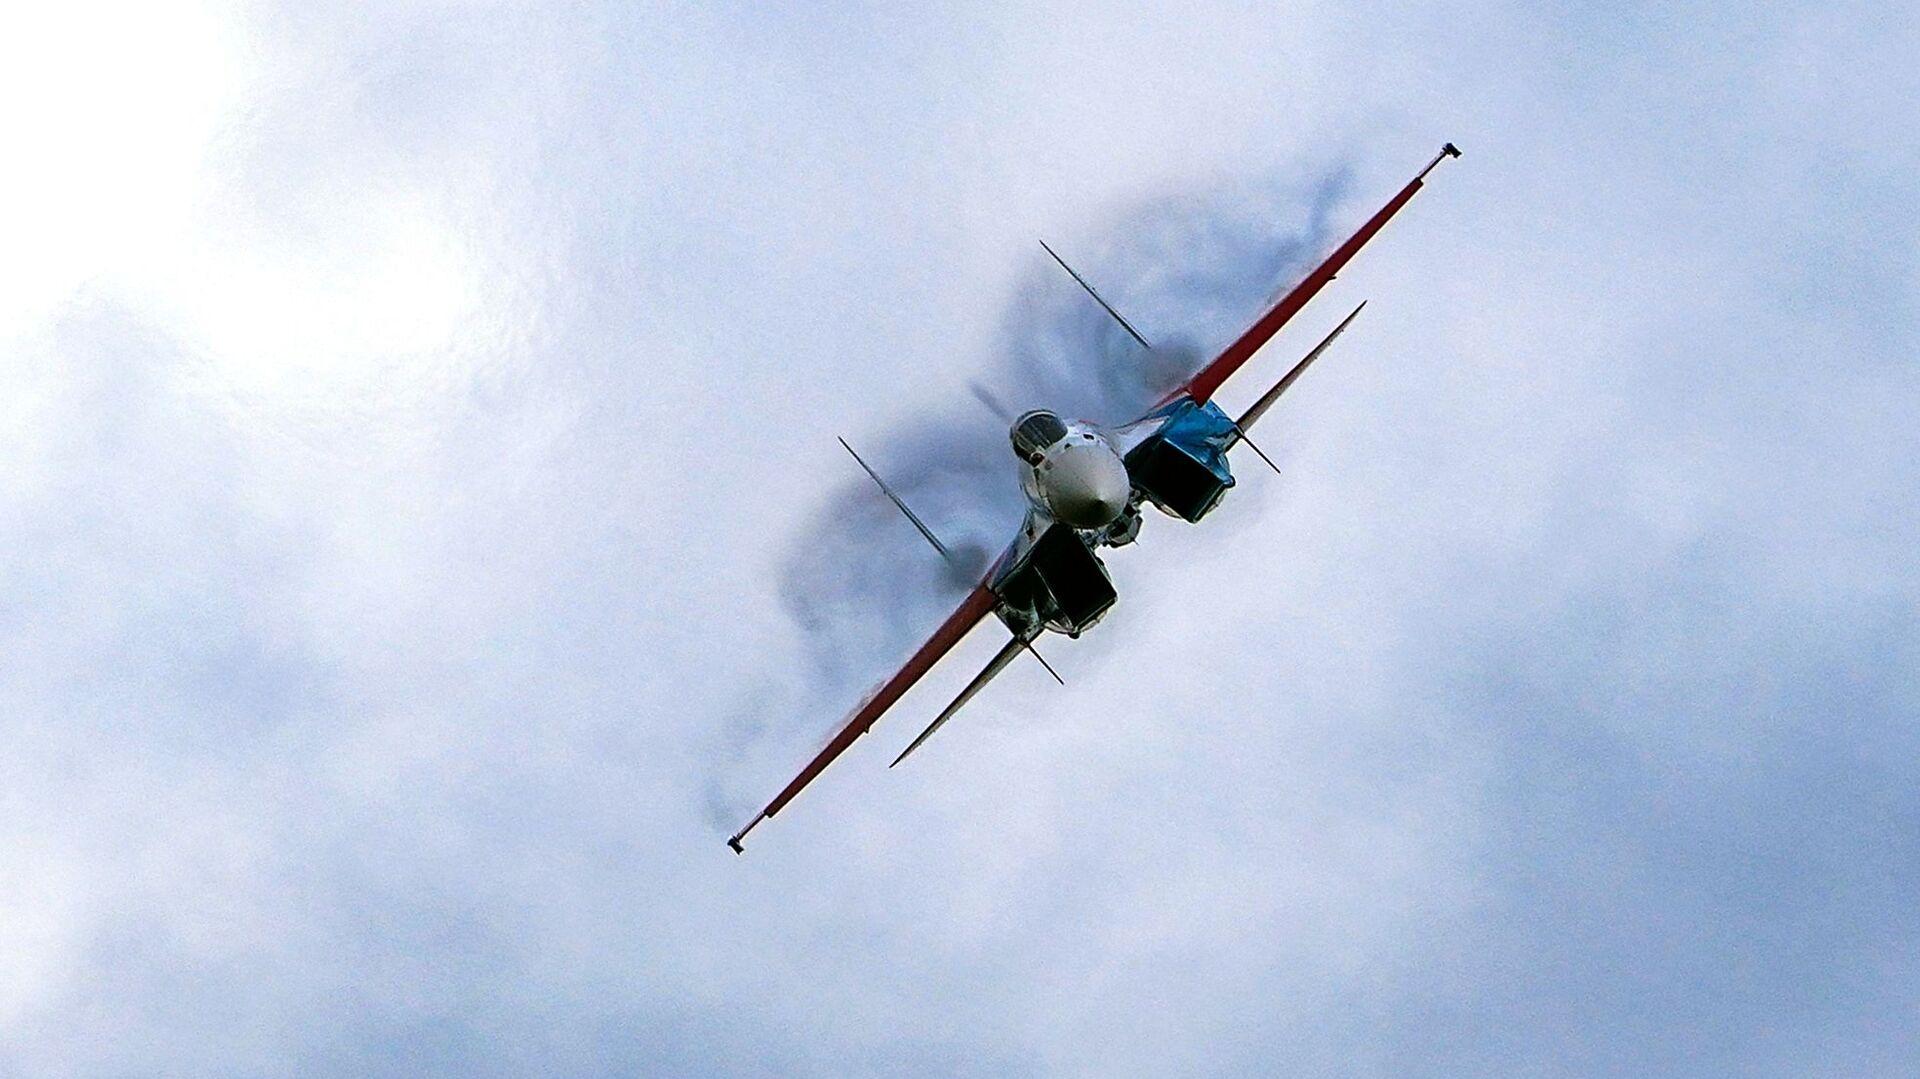 Su-35 - Sputnik Česká republika, 1920, 31.07.2021